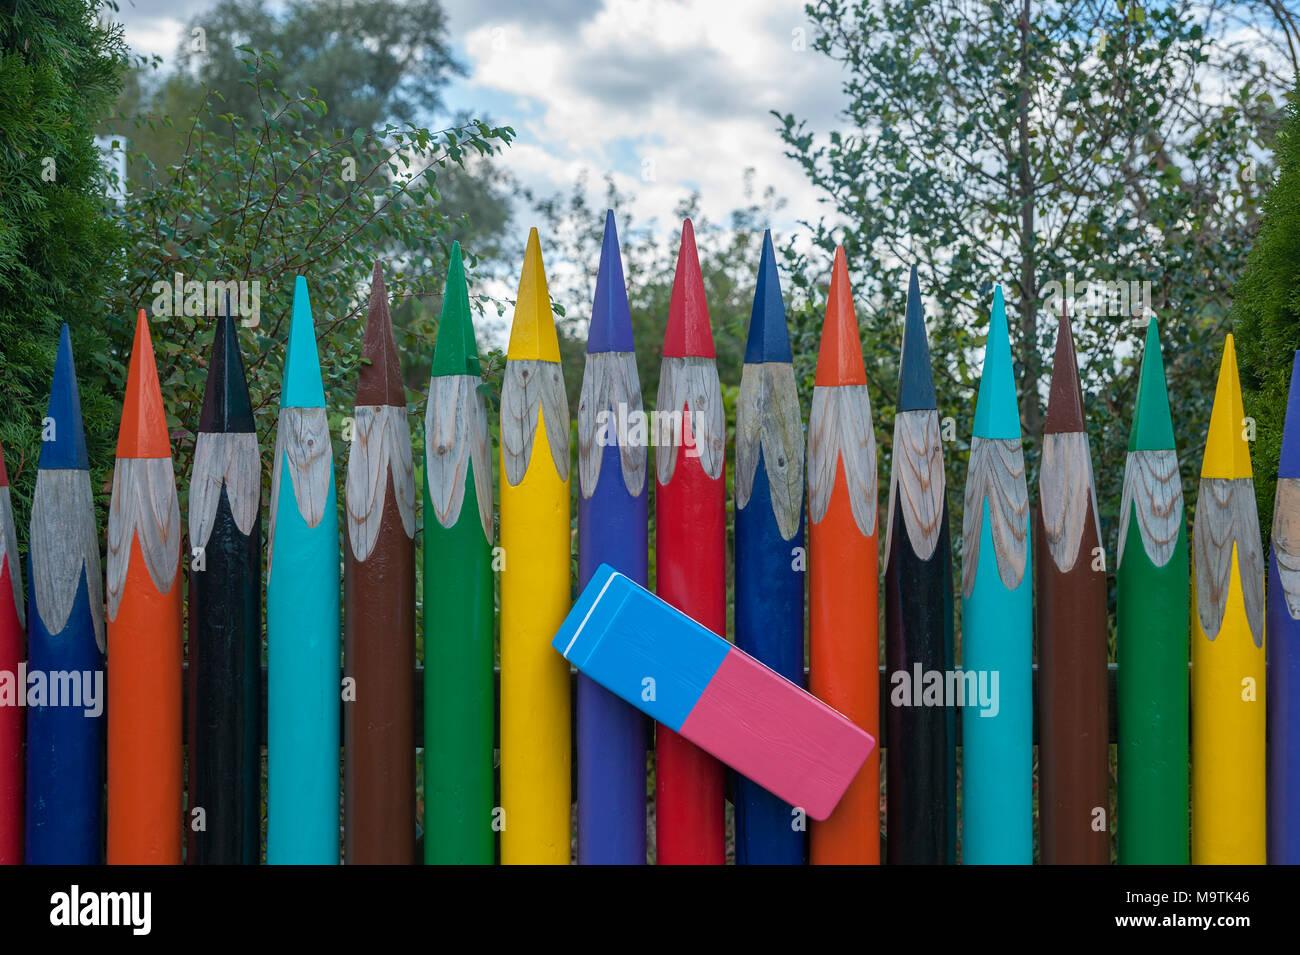 Colored pencils as garden fence in the fishing village Gothmund, Lubeck Gothmund, Baltic Sea, Schleswig-Holstein, Germany, Europe - Stock Image